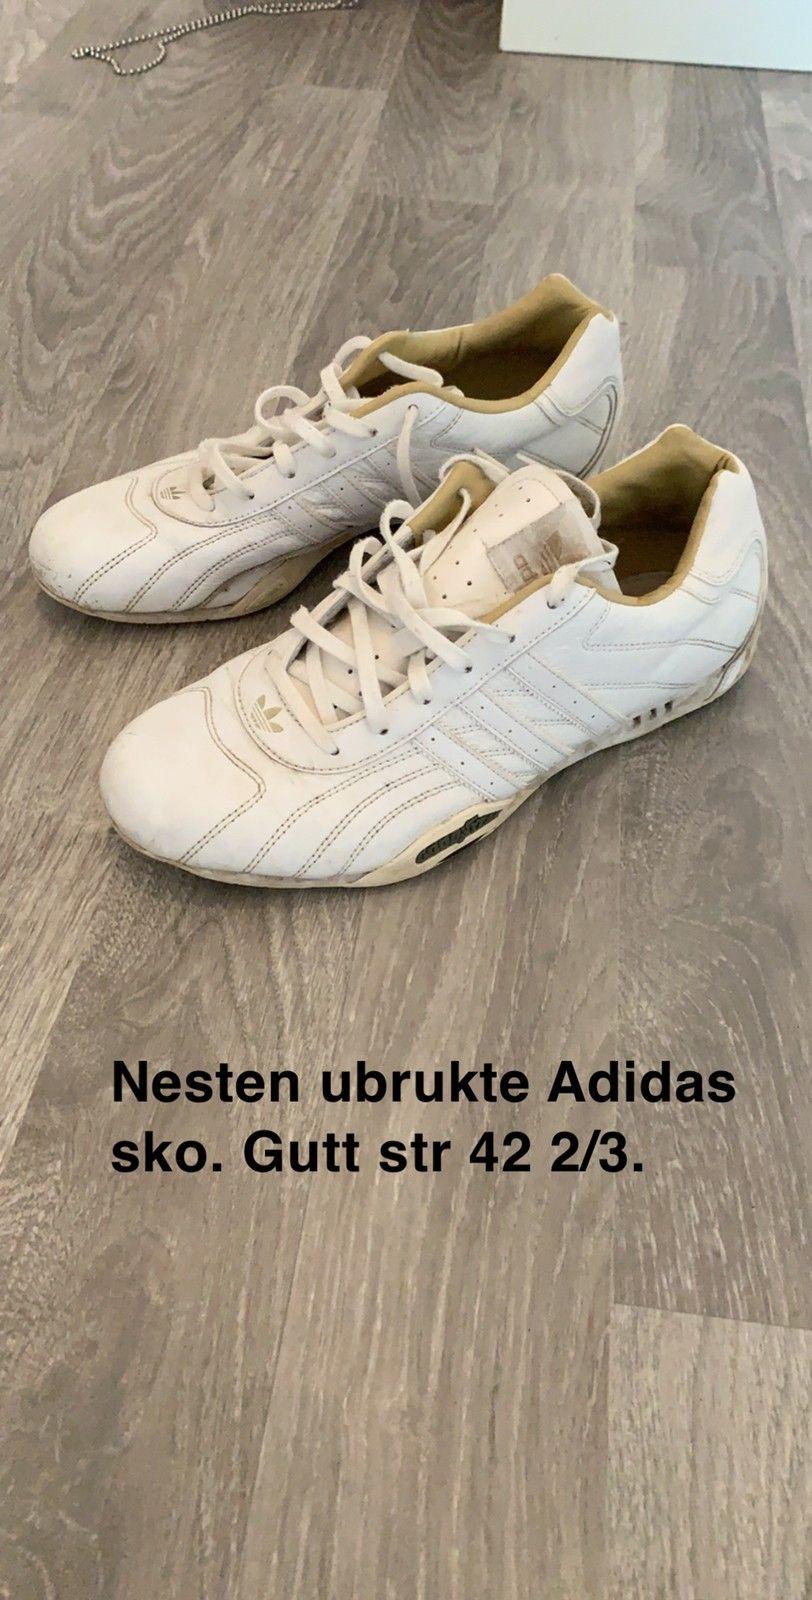 ADIDAS SKO HERRE | FINN.no